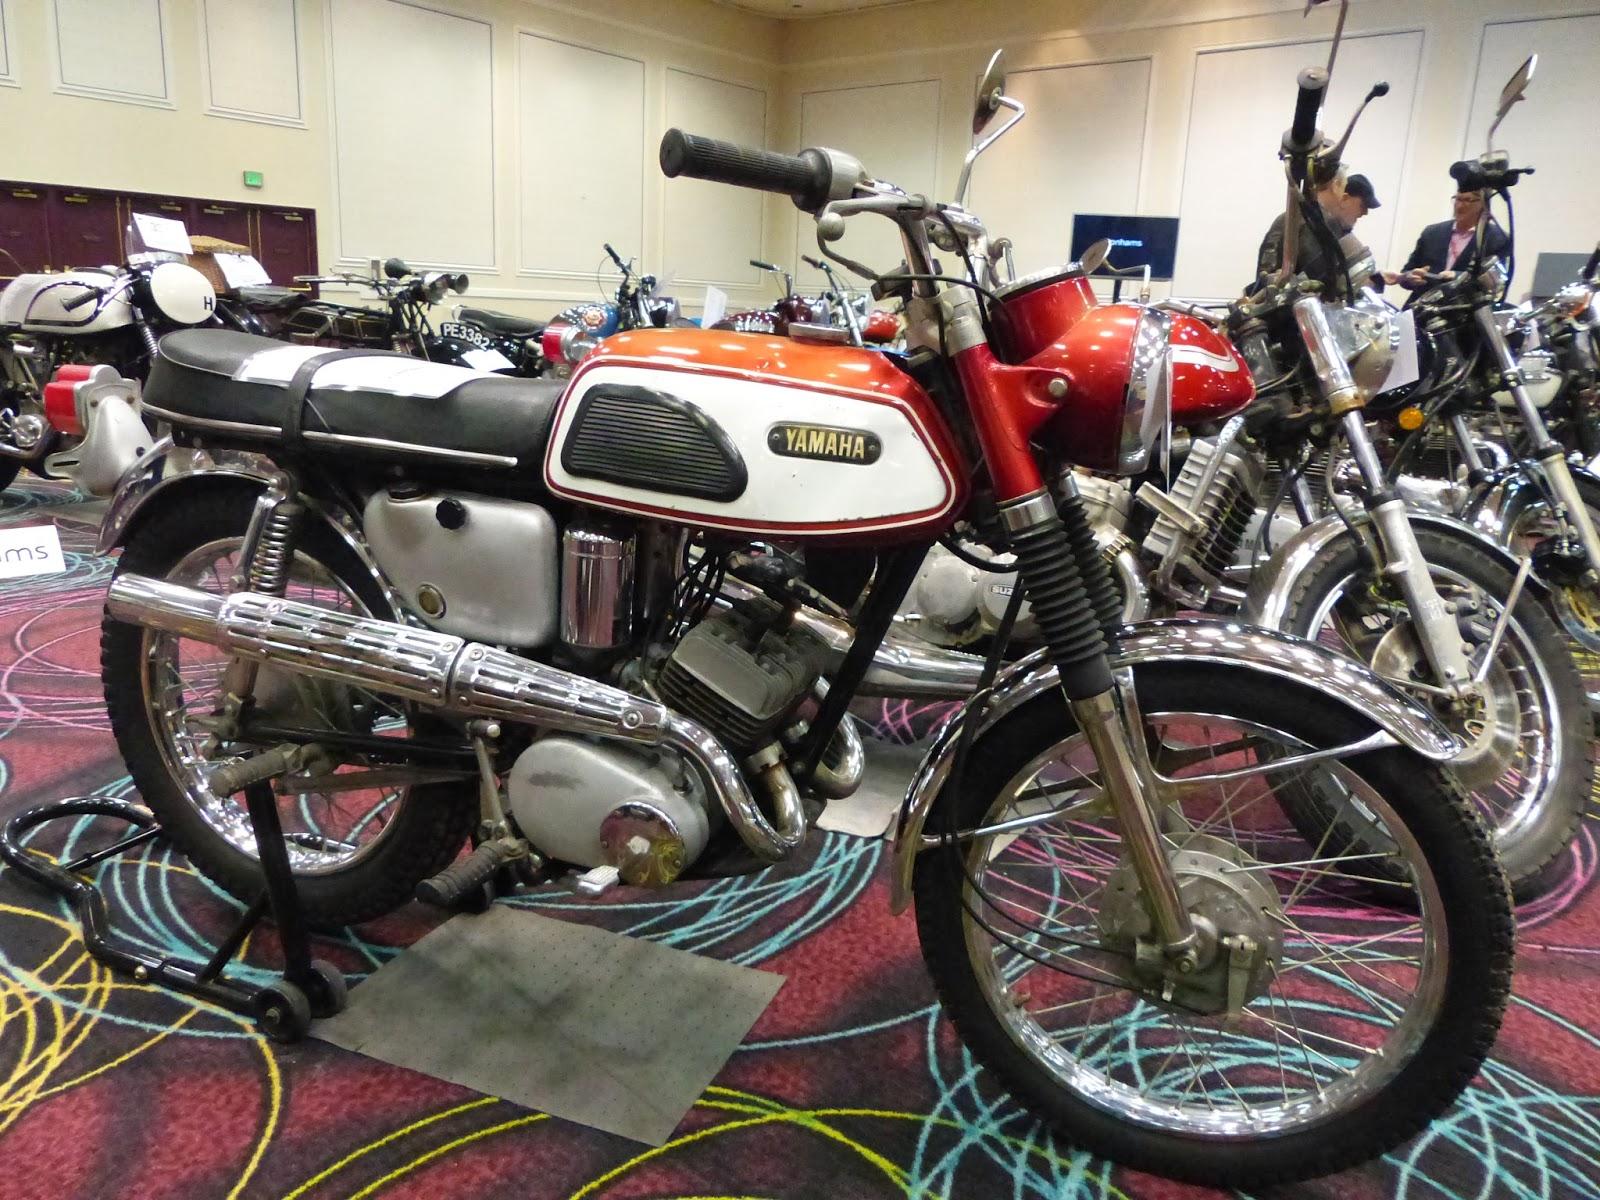 oldmotodude 1968 yamaha as 1 125 sold for 2 760 at the 2016 bonhams las vegas motorcycle auction. Black Bedroom Furniture Sets. Home Design Ideas